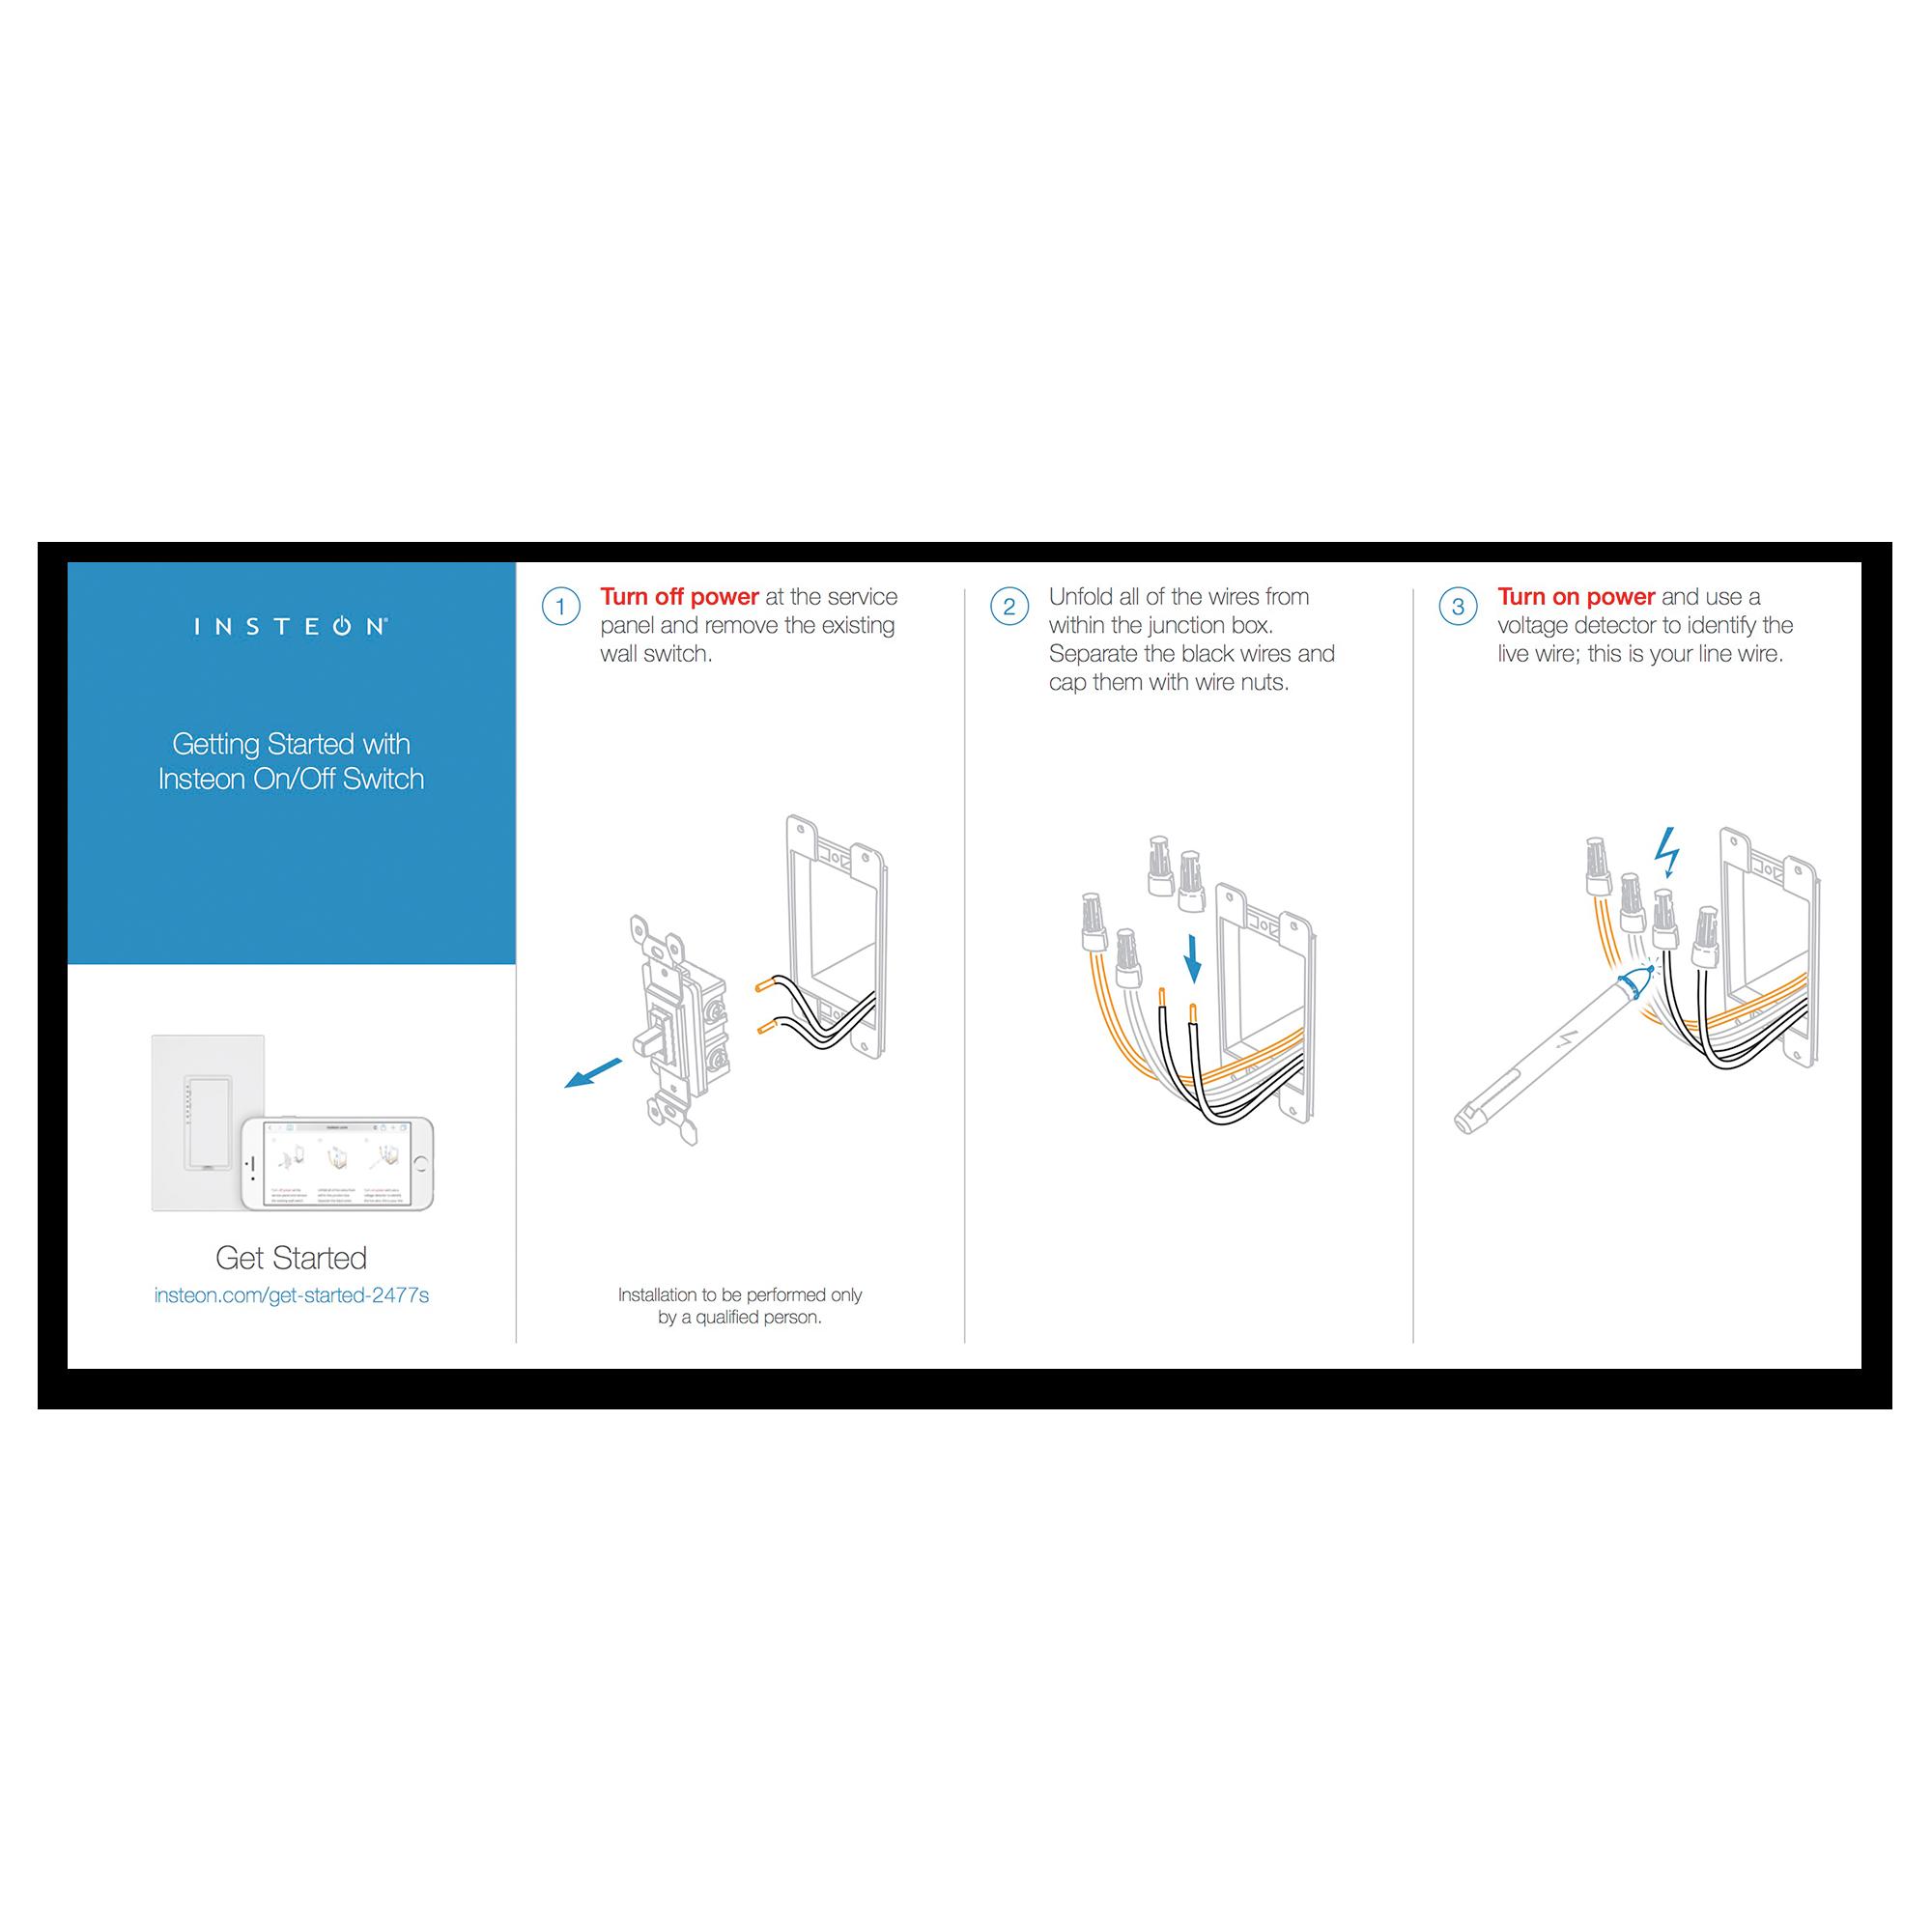 Support Knowledgebase — Insteon on venstar thermostat wiring diagram, hvac thermostat wiring diagram, honeywell thermostat wiring diagram, wifi thermostat wiring diagram, z wave thermostat wiring diagram, apple thermostat wiring diagram, ge thermostat wiring diagram, control4 thermostat wiring diagram, hunter thermostat wiring diagram, six-wire thermostat wiring diagram, home thermostat wiring diagram, crestron thermostat wiring diagram,